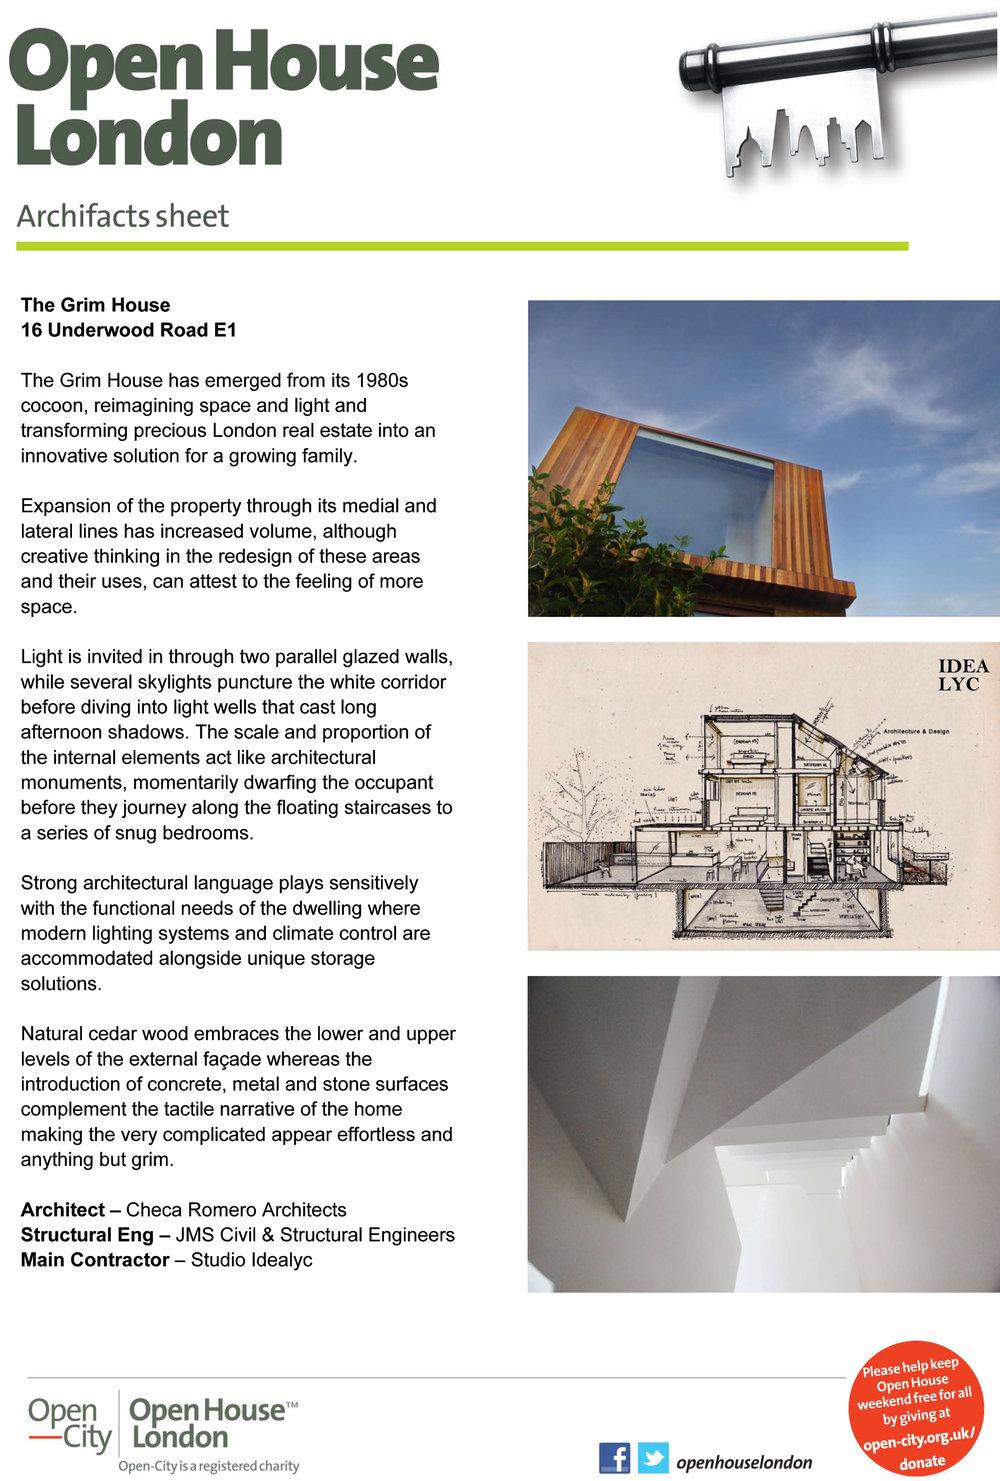 thegrimhouse-factsheet-1-openhouse2015v2-compressed.jpg